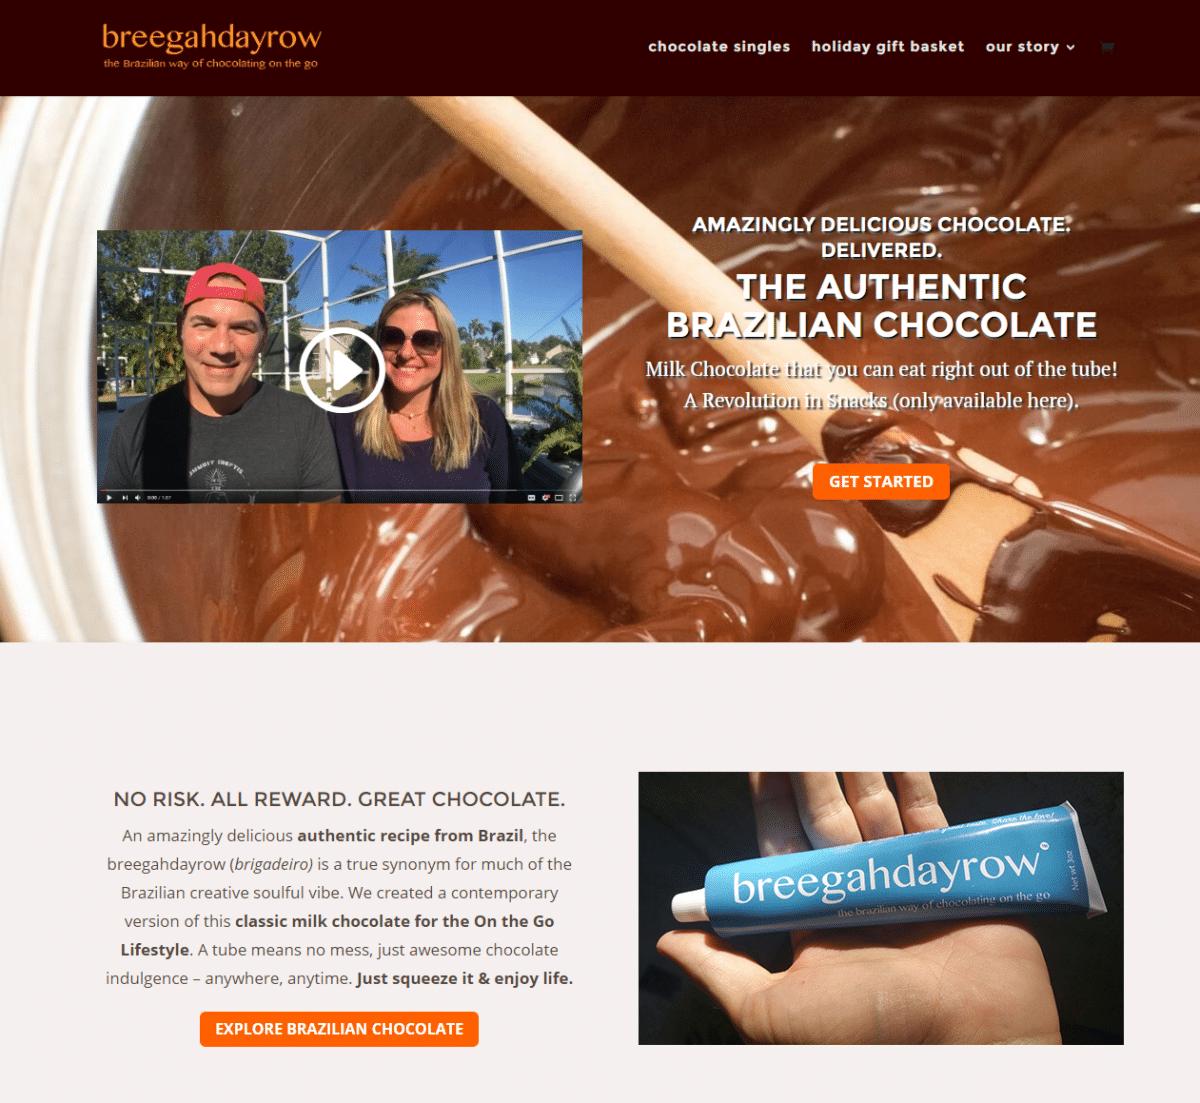 breegahdayrow™ chocolate a new way of enjoying brazilian chocolate